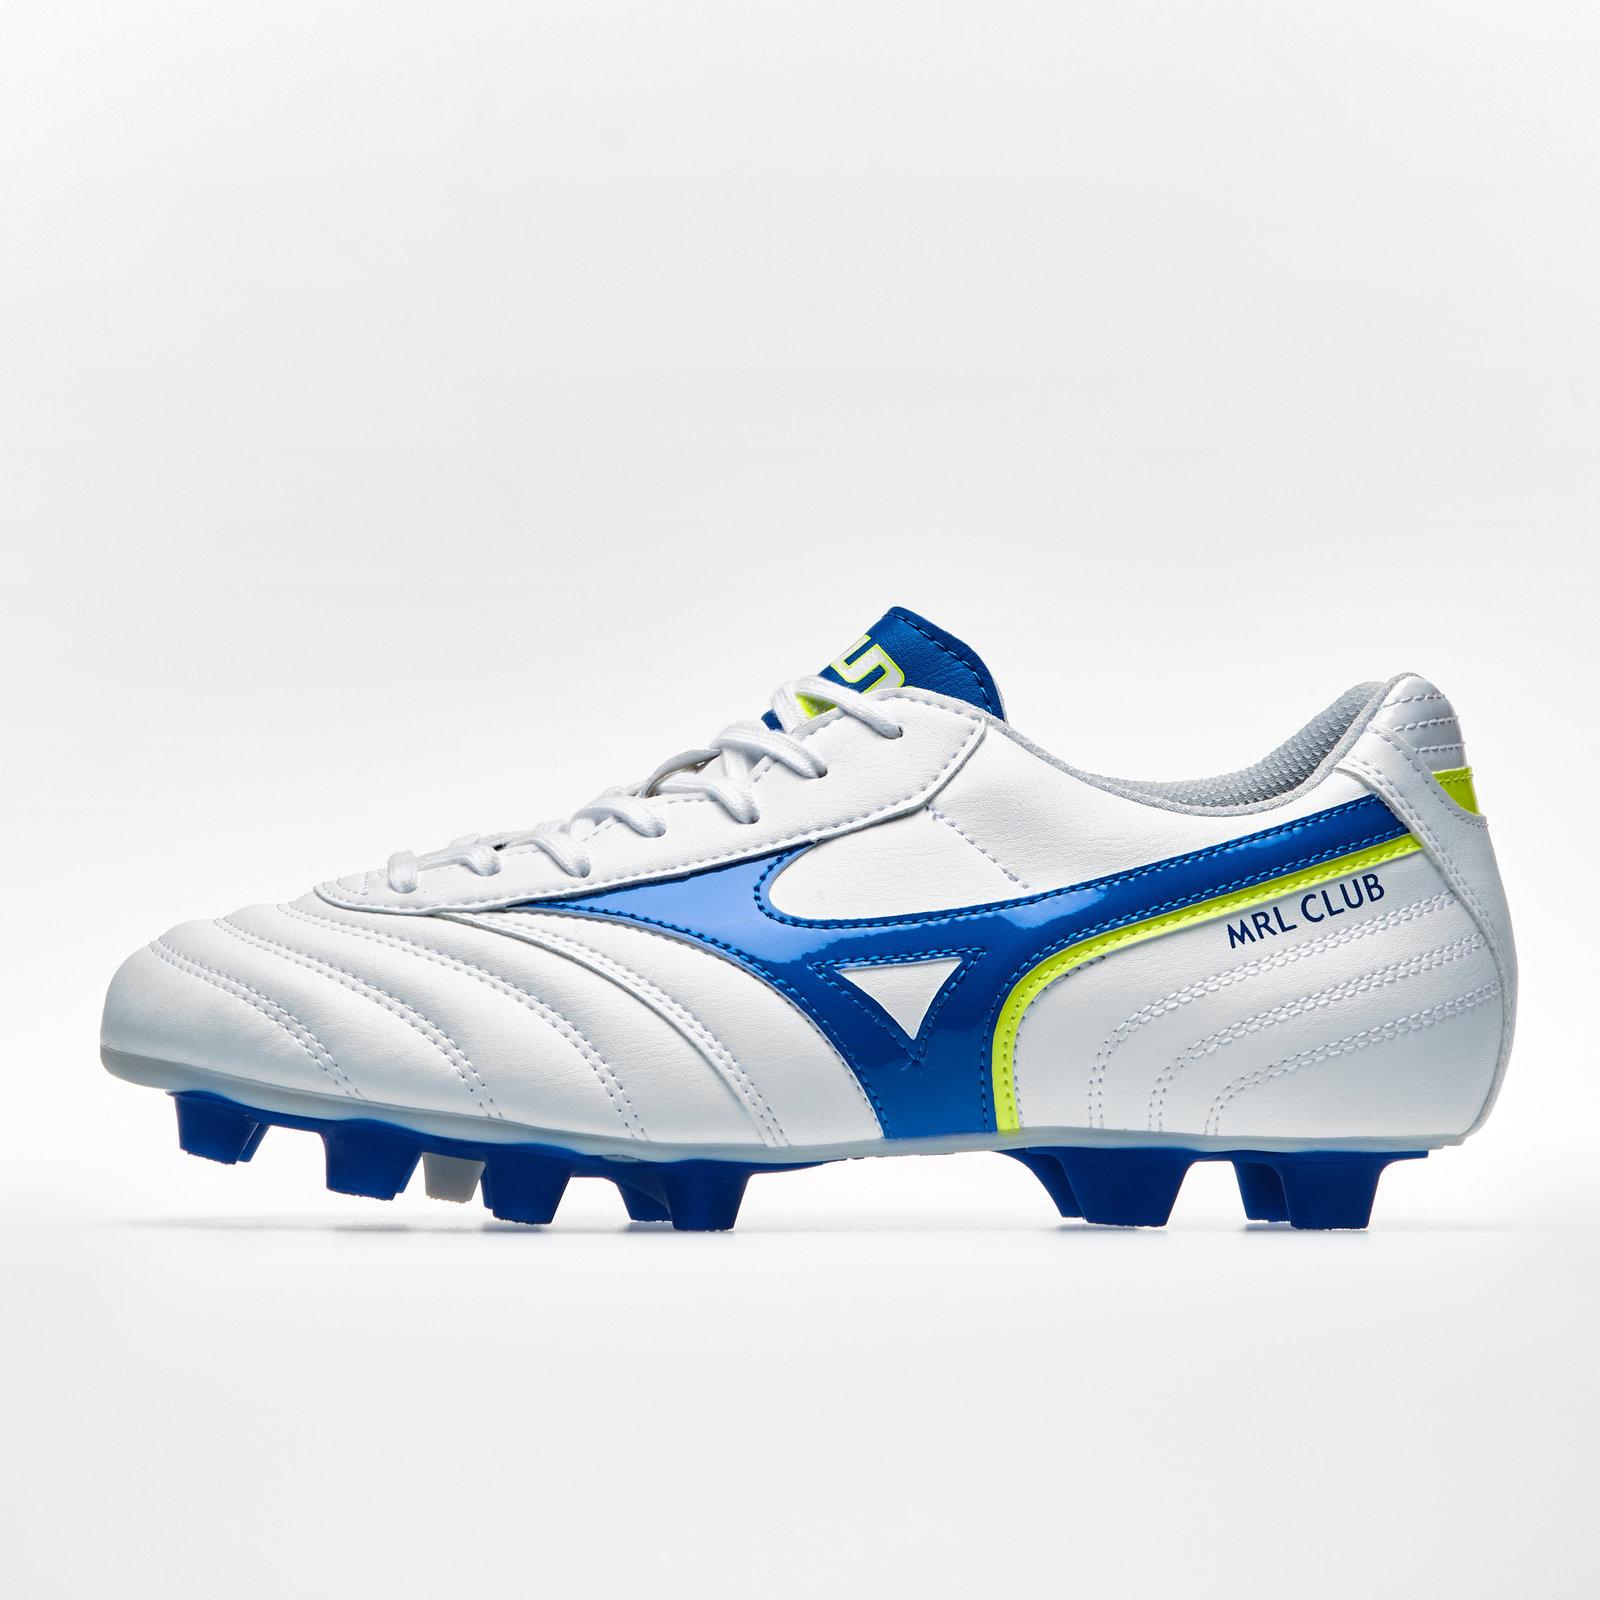 b73ccd5f9187 Mizuno Football Boots | Mizuno Morelia Deals | Compare with Footy.com